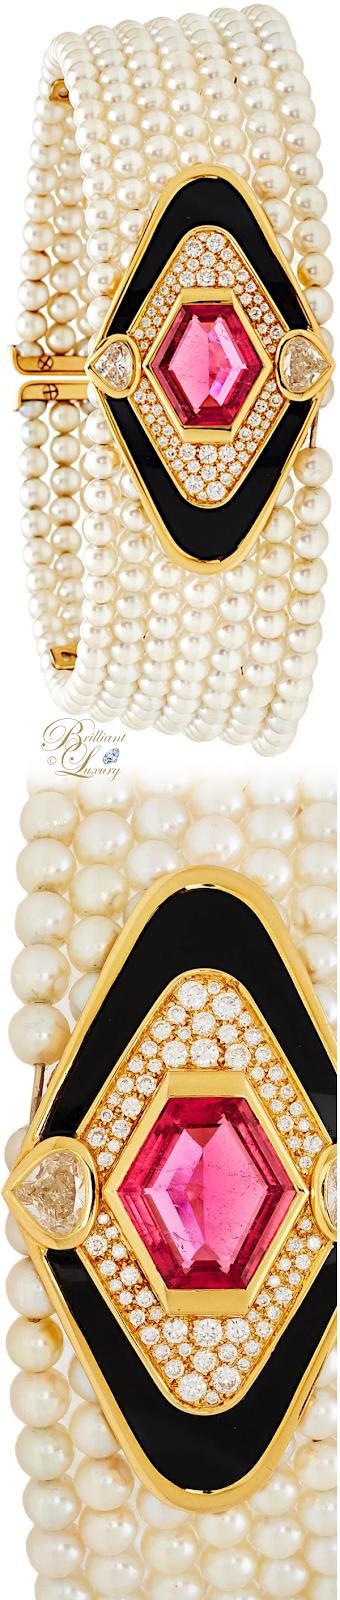 Brilliant Luxury♦Vintage Marina B Pearl And Multi Stone Collar #necklace